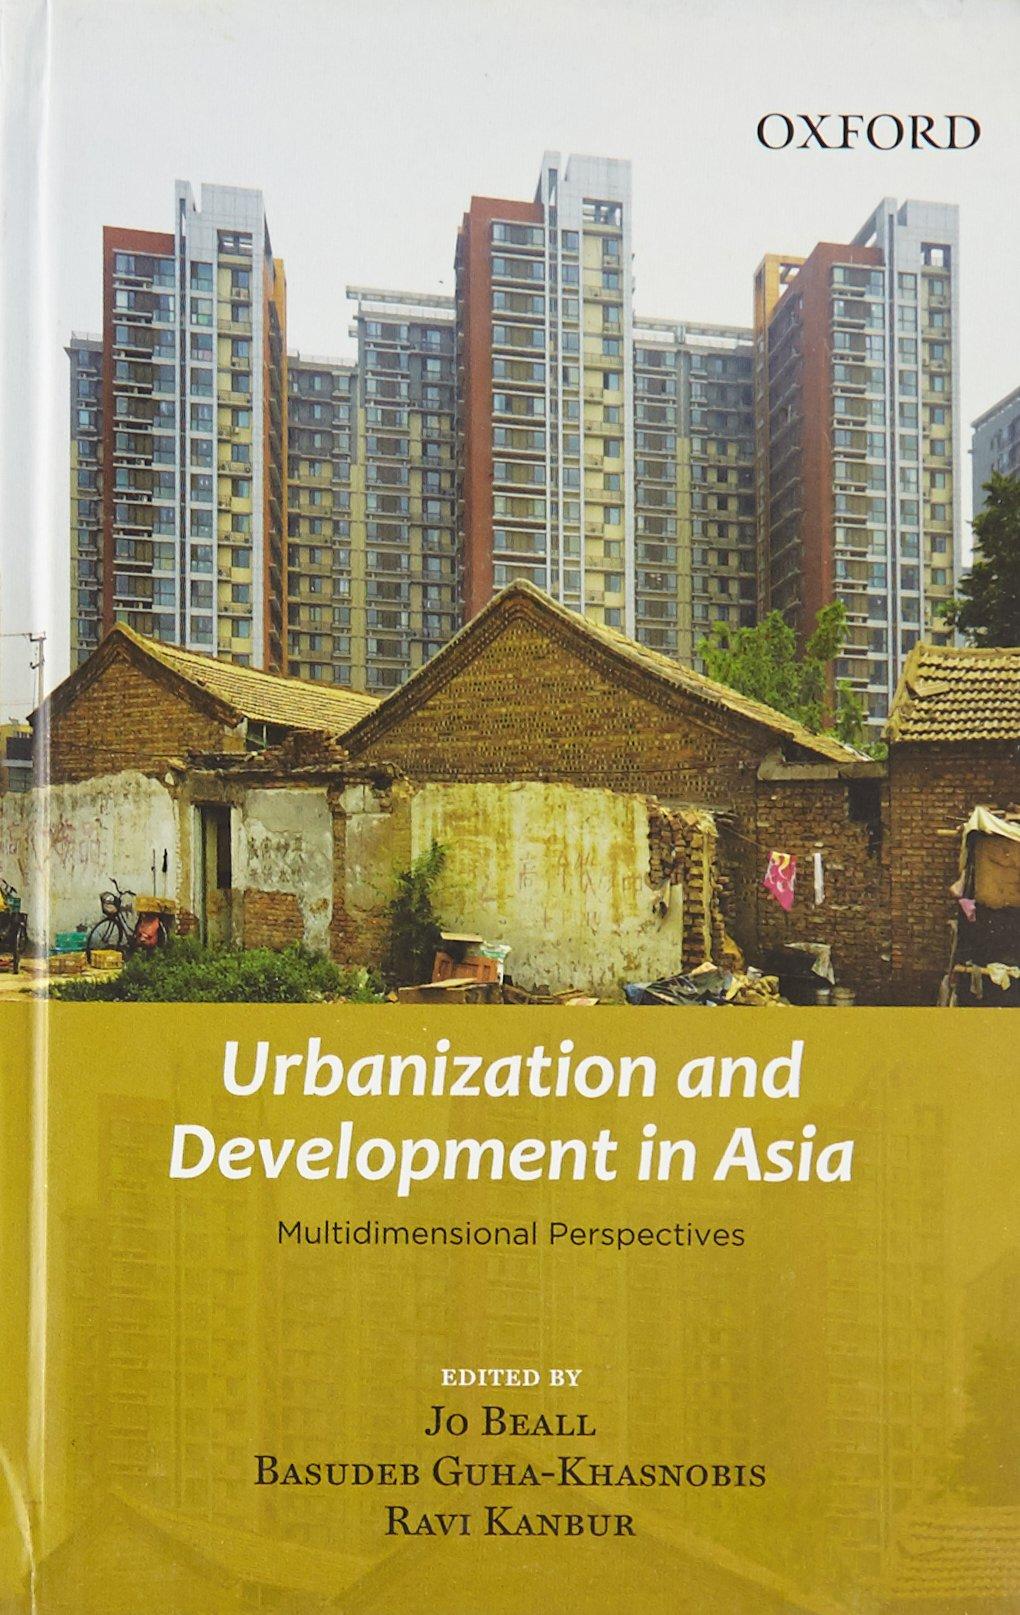 Urbanization and Development in Asia: Multidimensional Perspectives:  Amazon.in: Jo Beall, Basudeb Guha-Khasnobis, Ravi Kanbur: Books